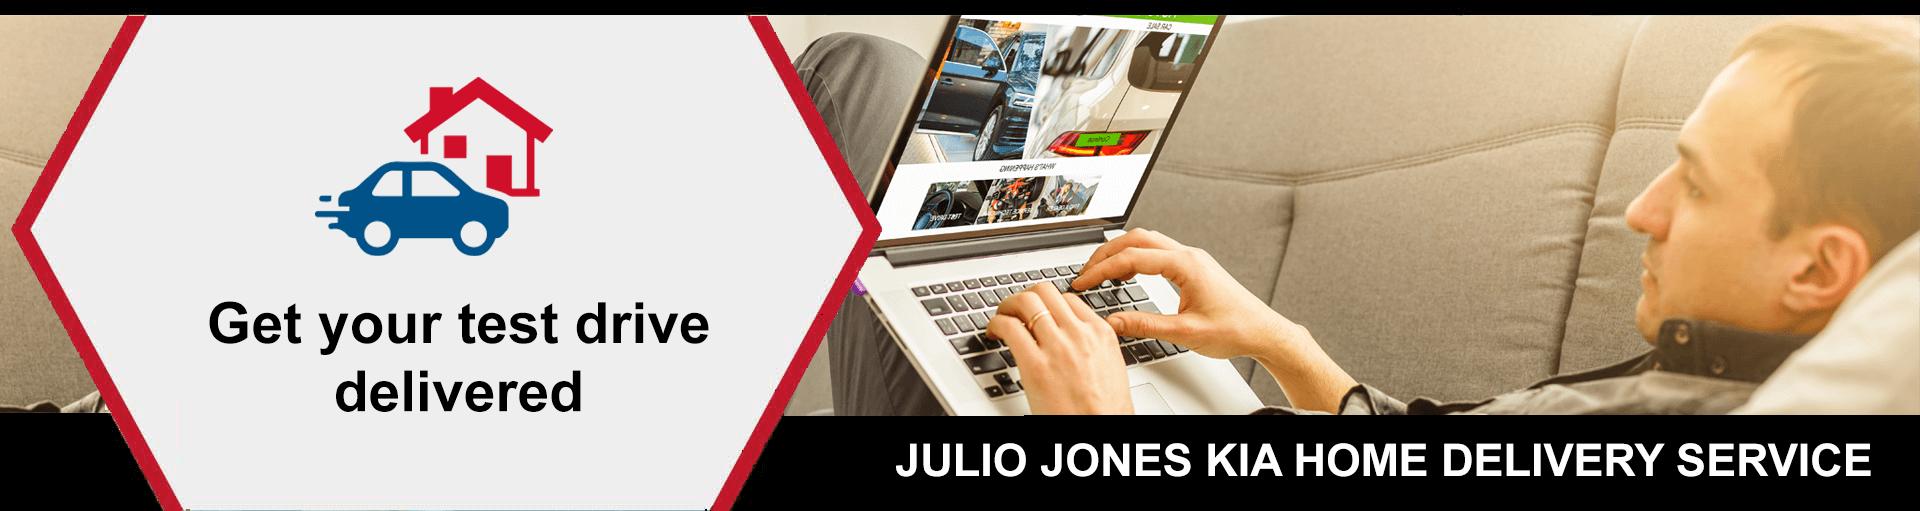 Julio Jones Kia Home Delivery